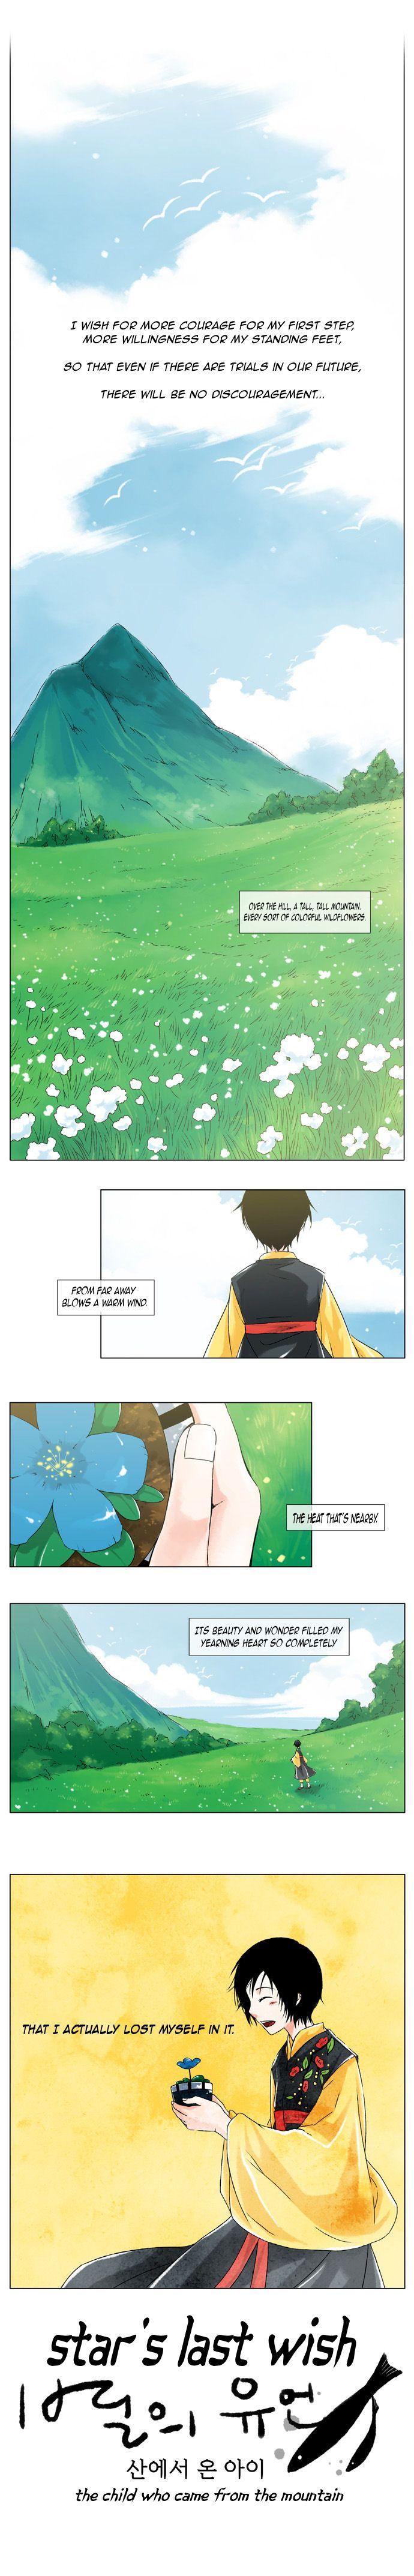 Star's Last Wish 0 Page 2